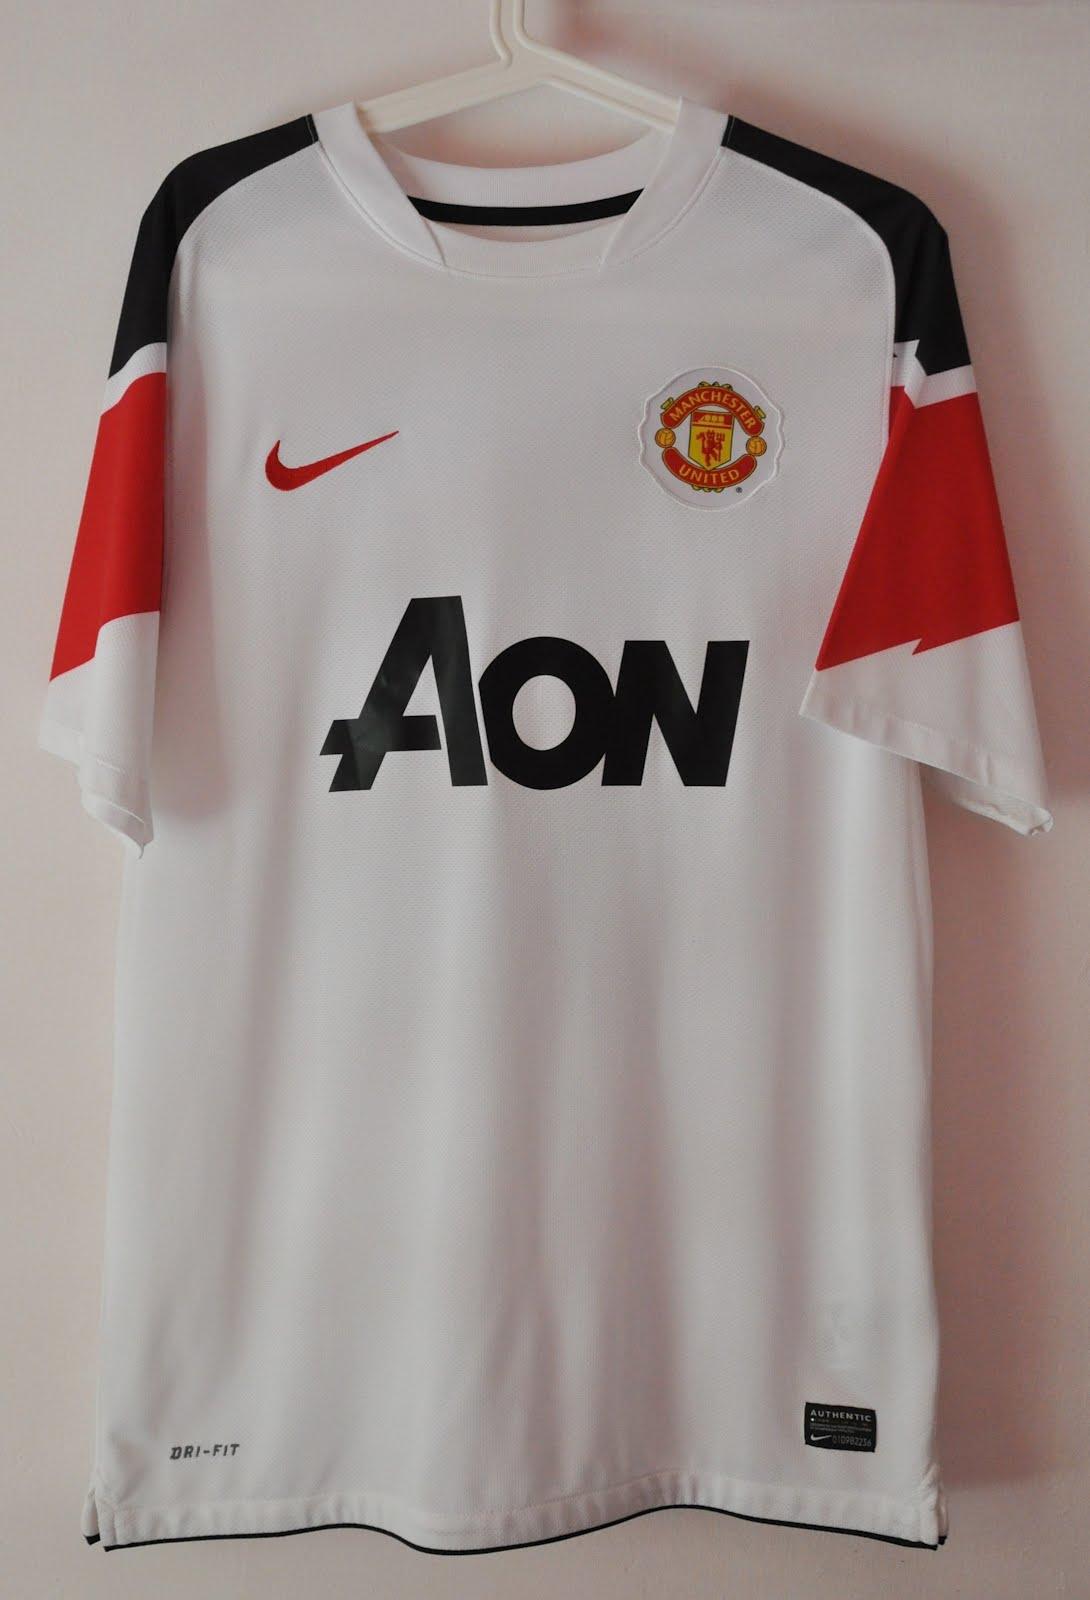 huge discount 2a661 60568 DAUS REDSCARZ: Manchester United 2010-2011 Away Kit ...